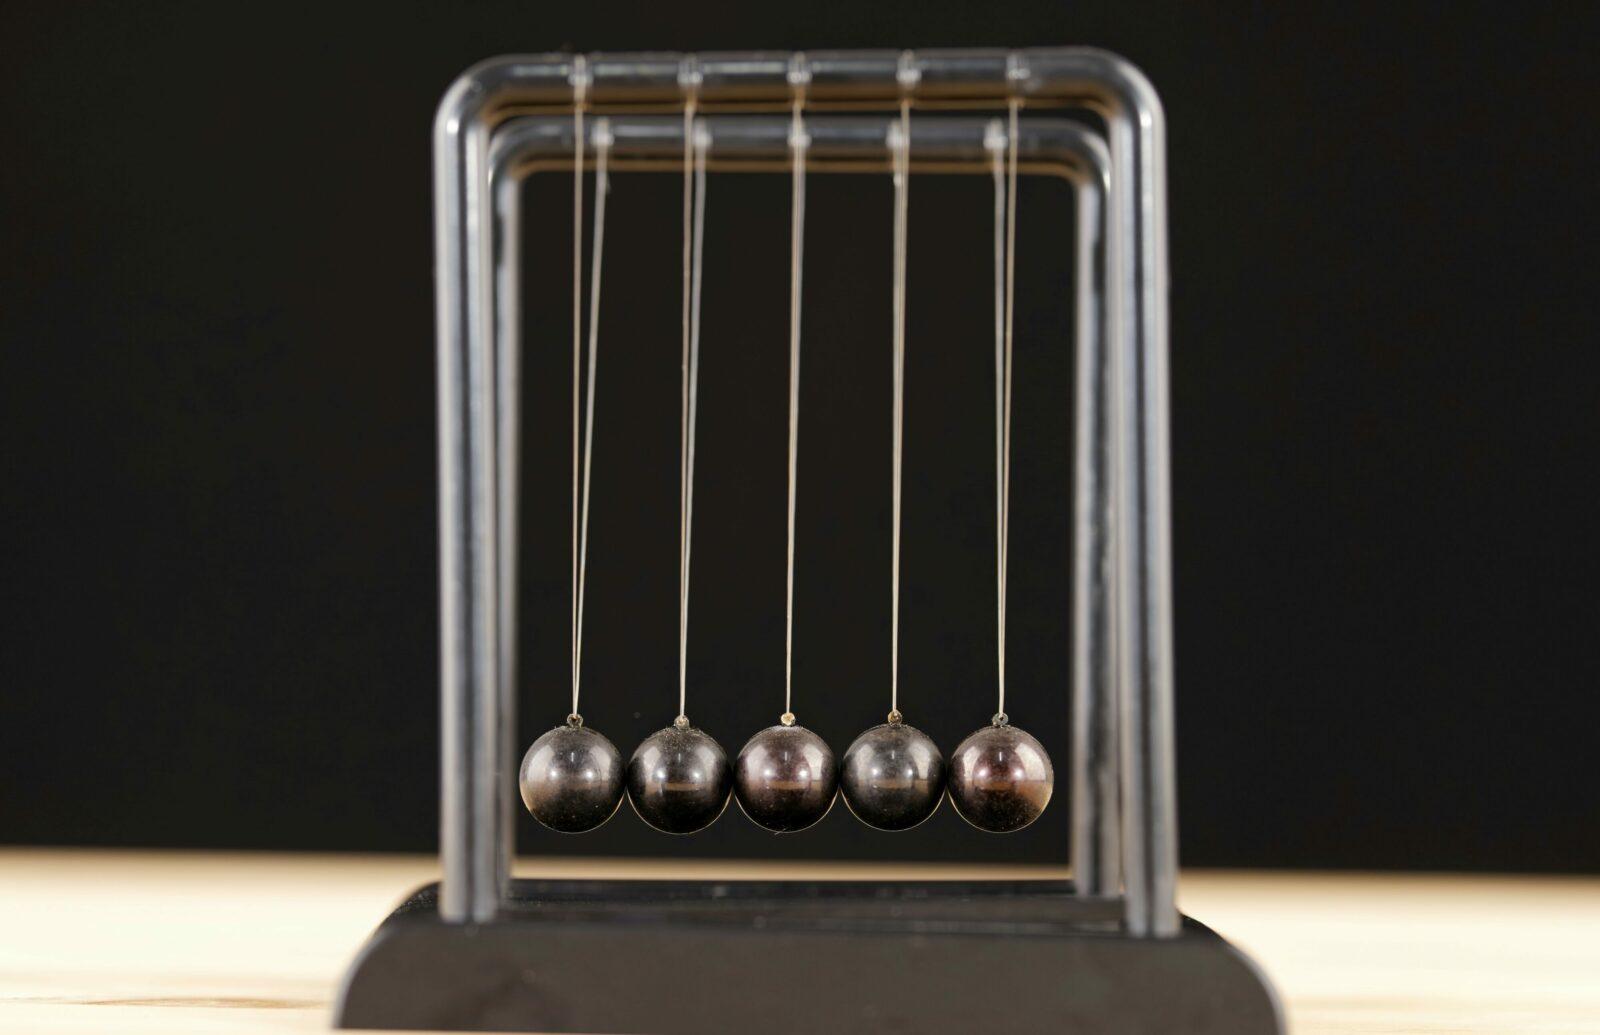 A Newton's cradle sitting on a desk